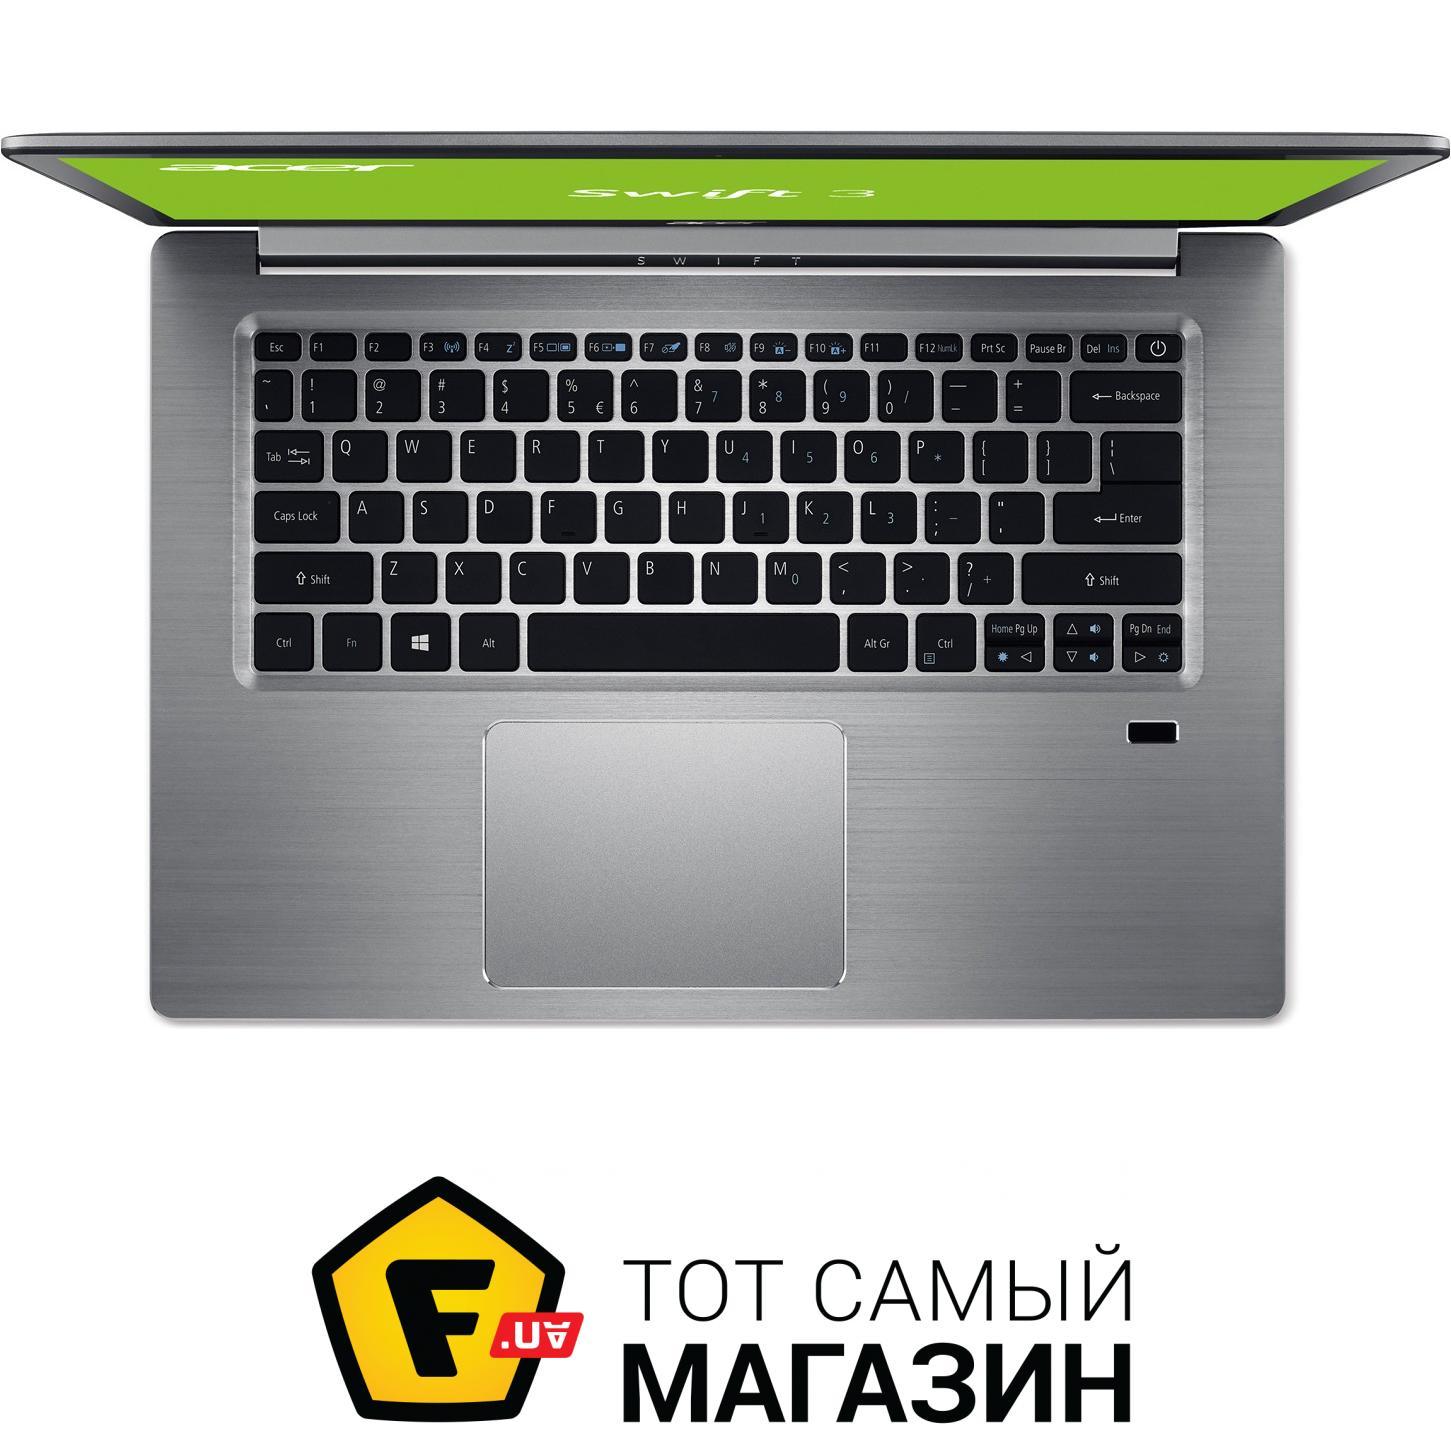 Ноутбук Acer Swift 5 SF514-51-75AC NX.GNHER.003 (Intel Core i7-7500U 2.7 GHz/8192Mb/256Gb SSD/No ODD/Intel HD Graphics/Wi-Fi/Bluetooth/Cam/14.0/1920x1080/Boot-up Linux)